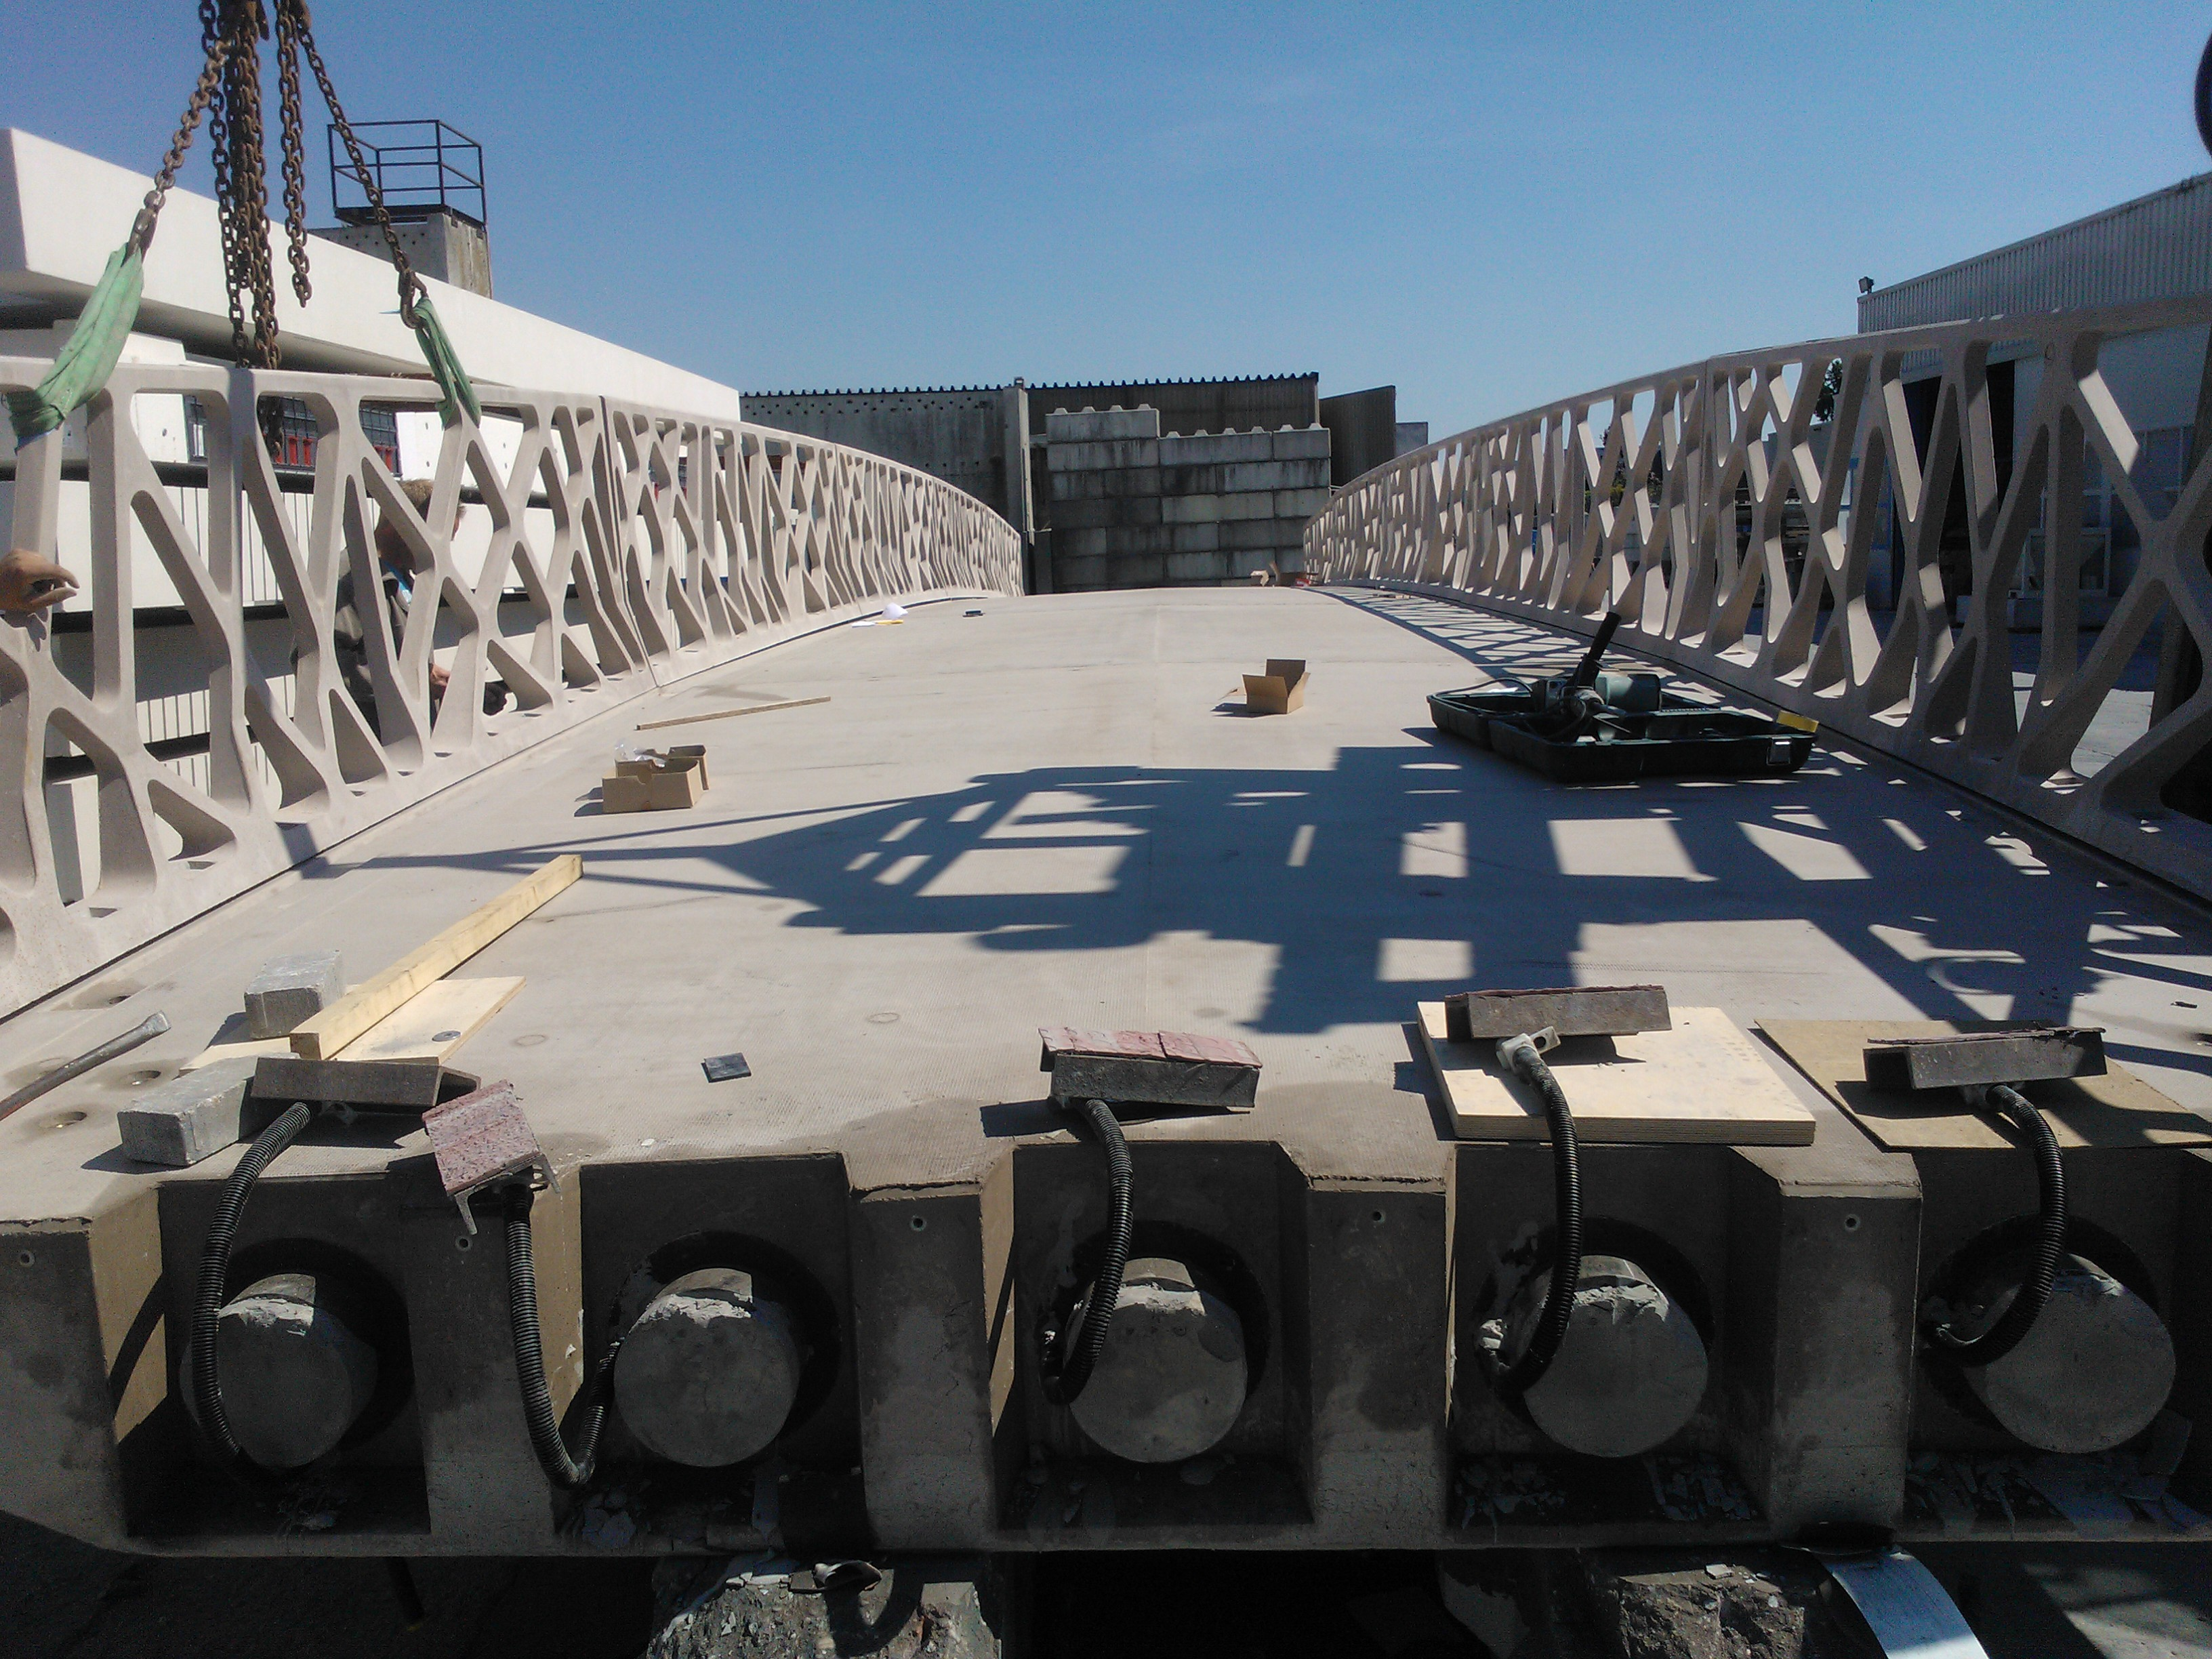 Ultrabrug in Eindhoven